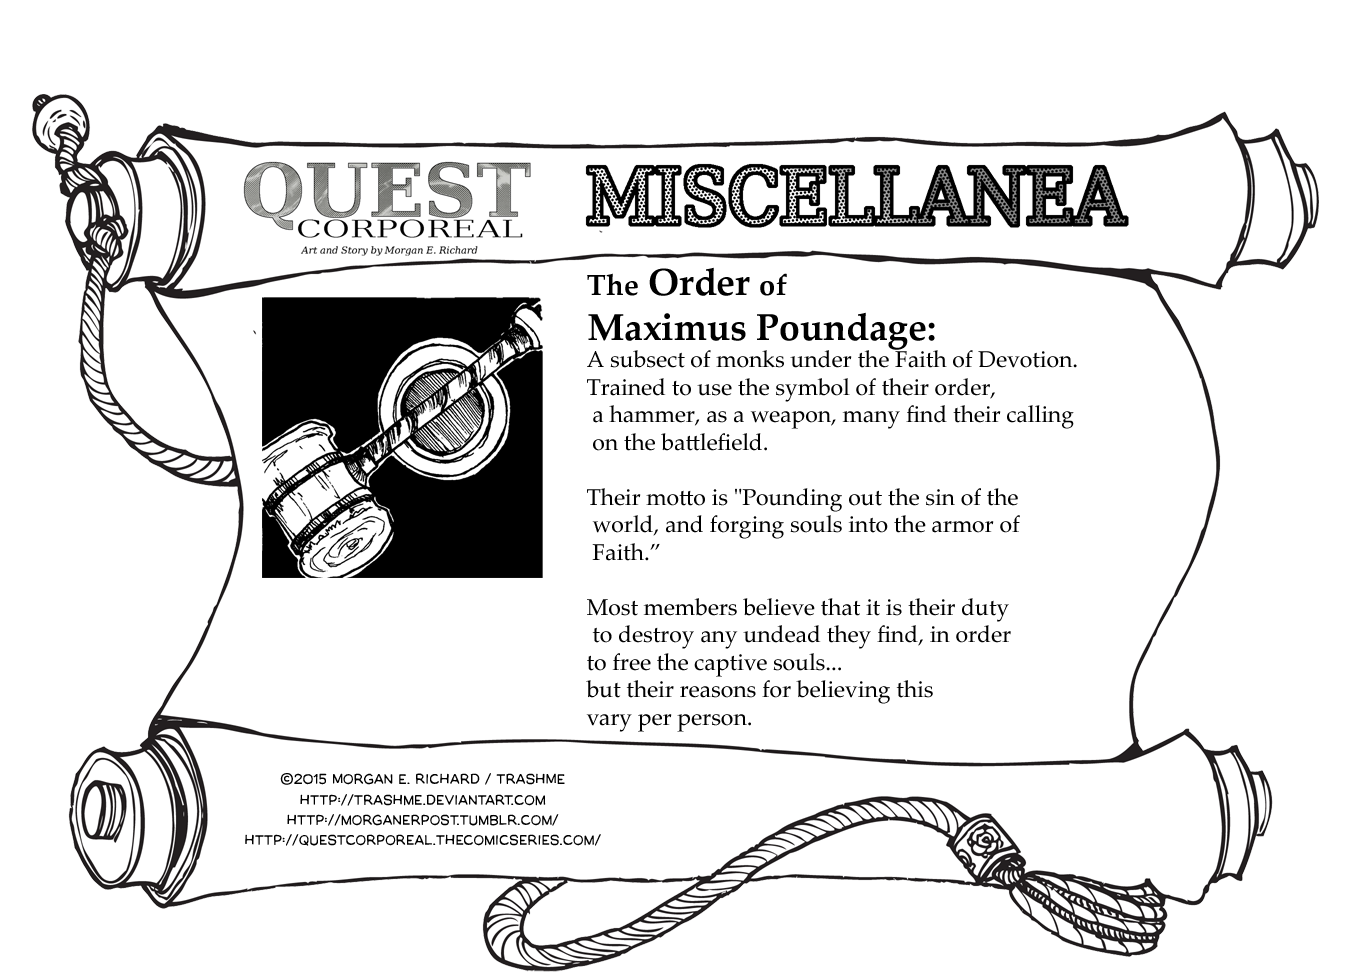 Miscellanea Corporeal: The Order of Maximus Poundage